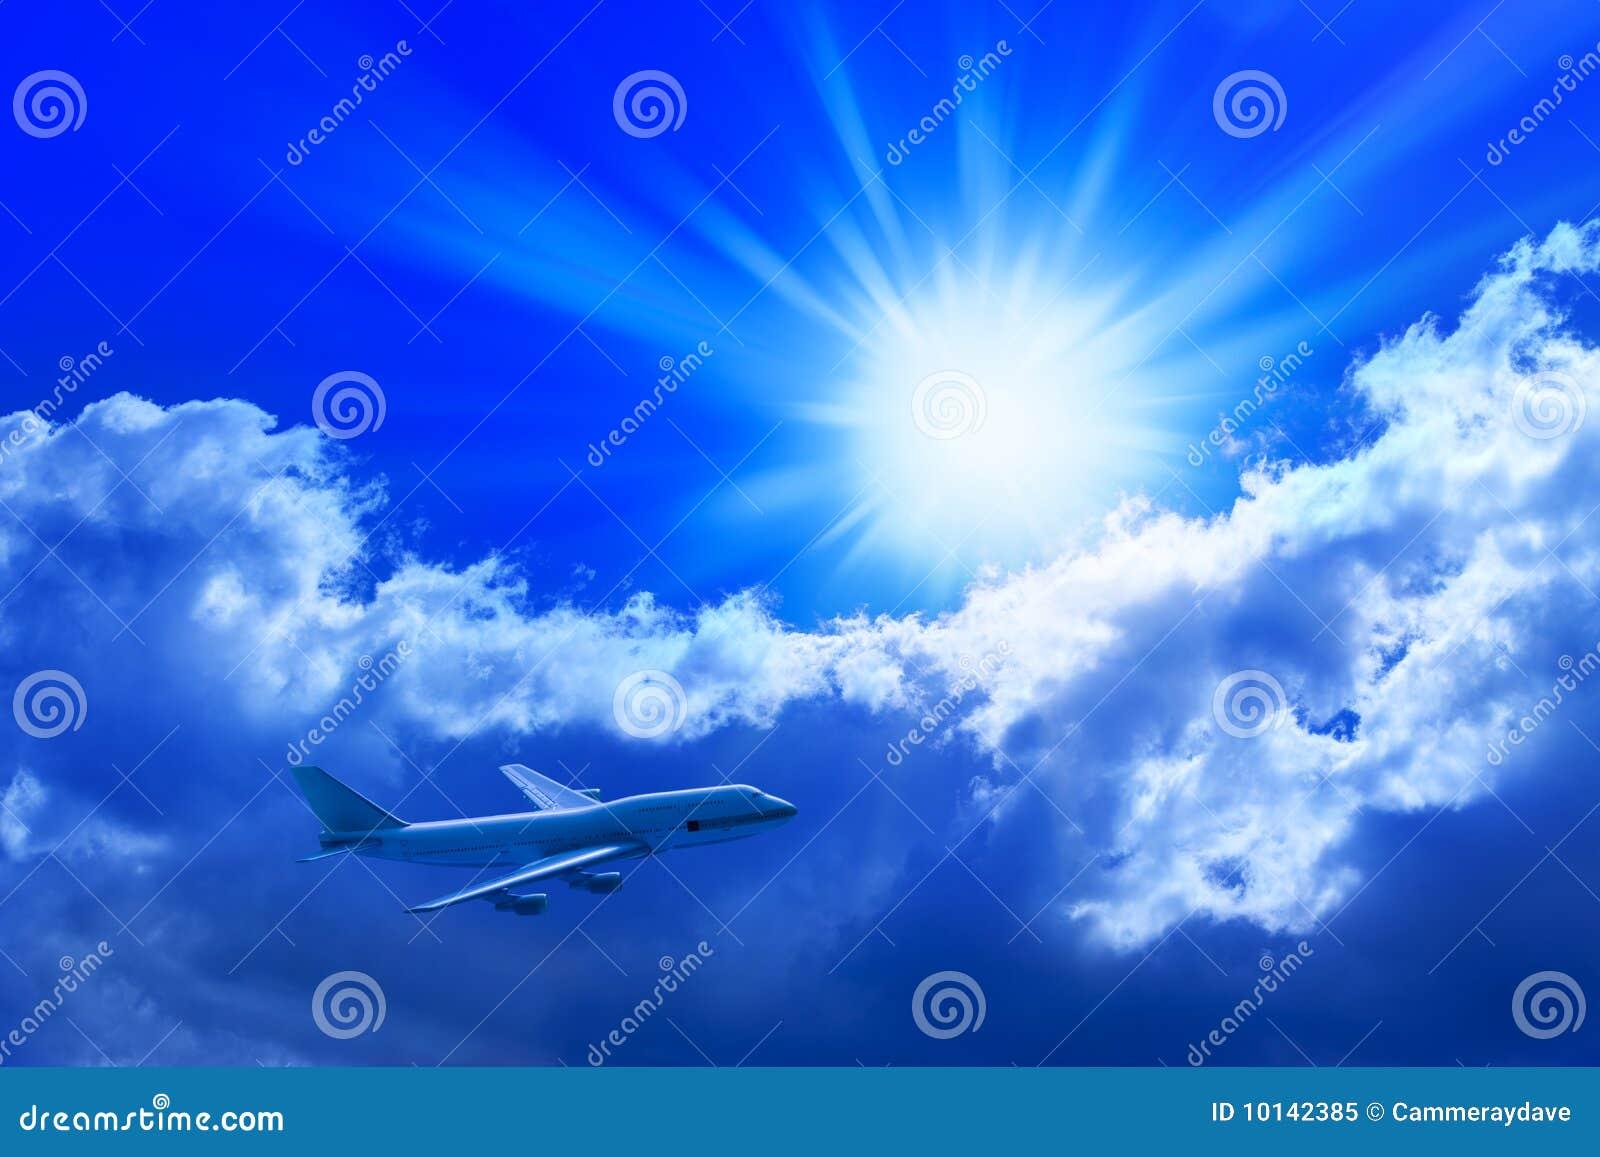 Vôo do avião através do céu